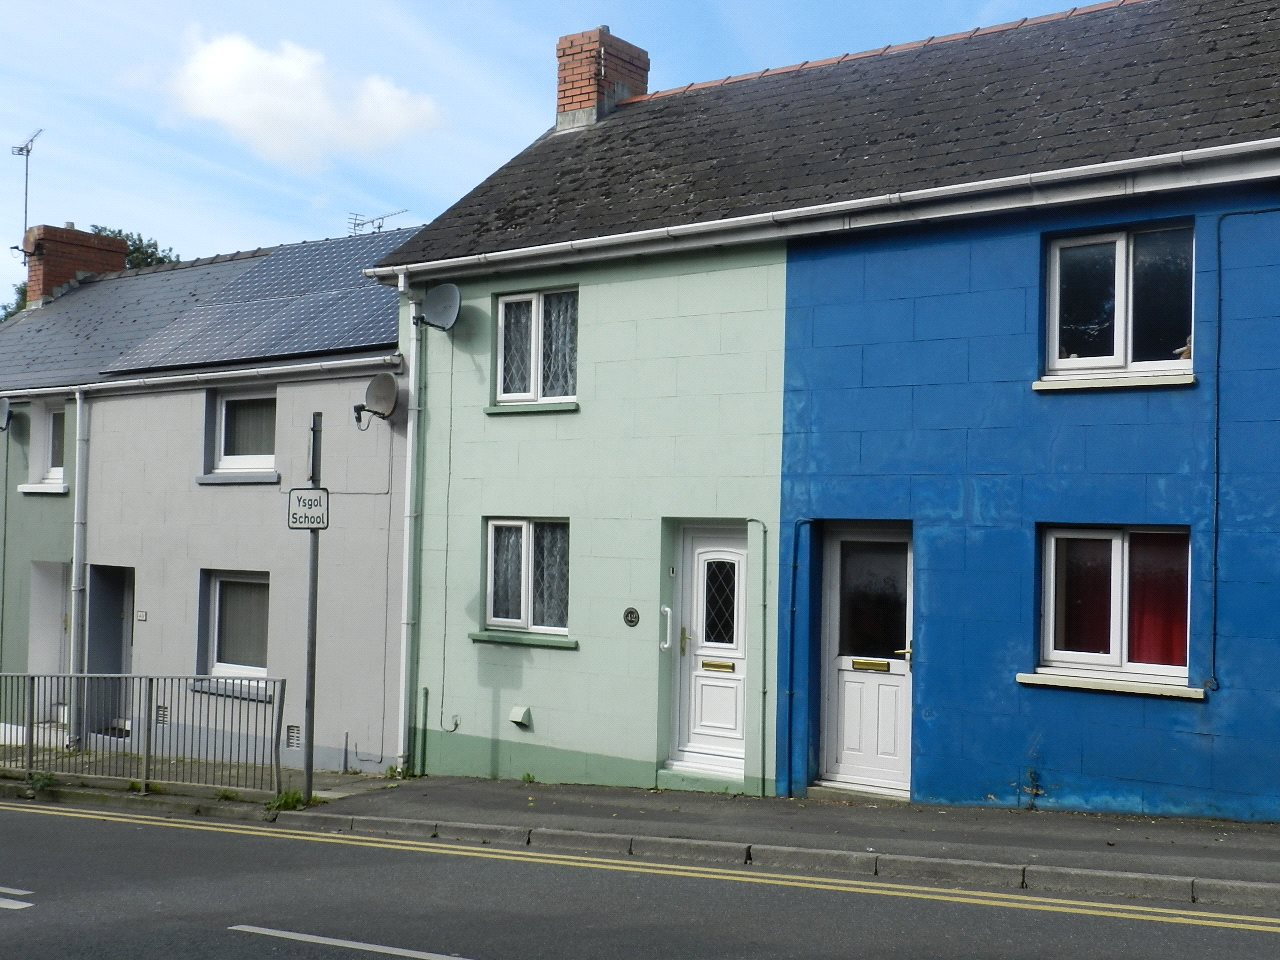 2 Bedrooms Terraced House for sale in Prendergast, Haverfordwest, Pembrokeshire